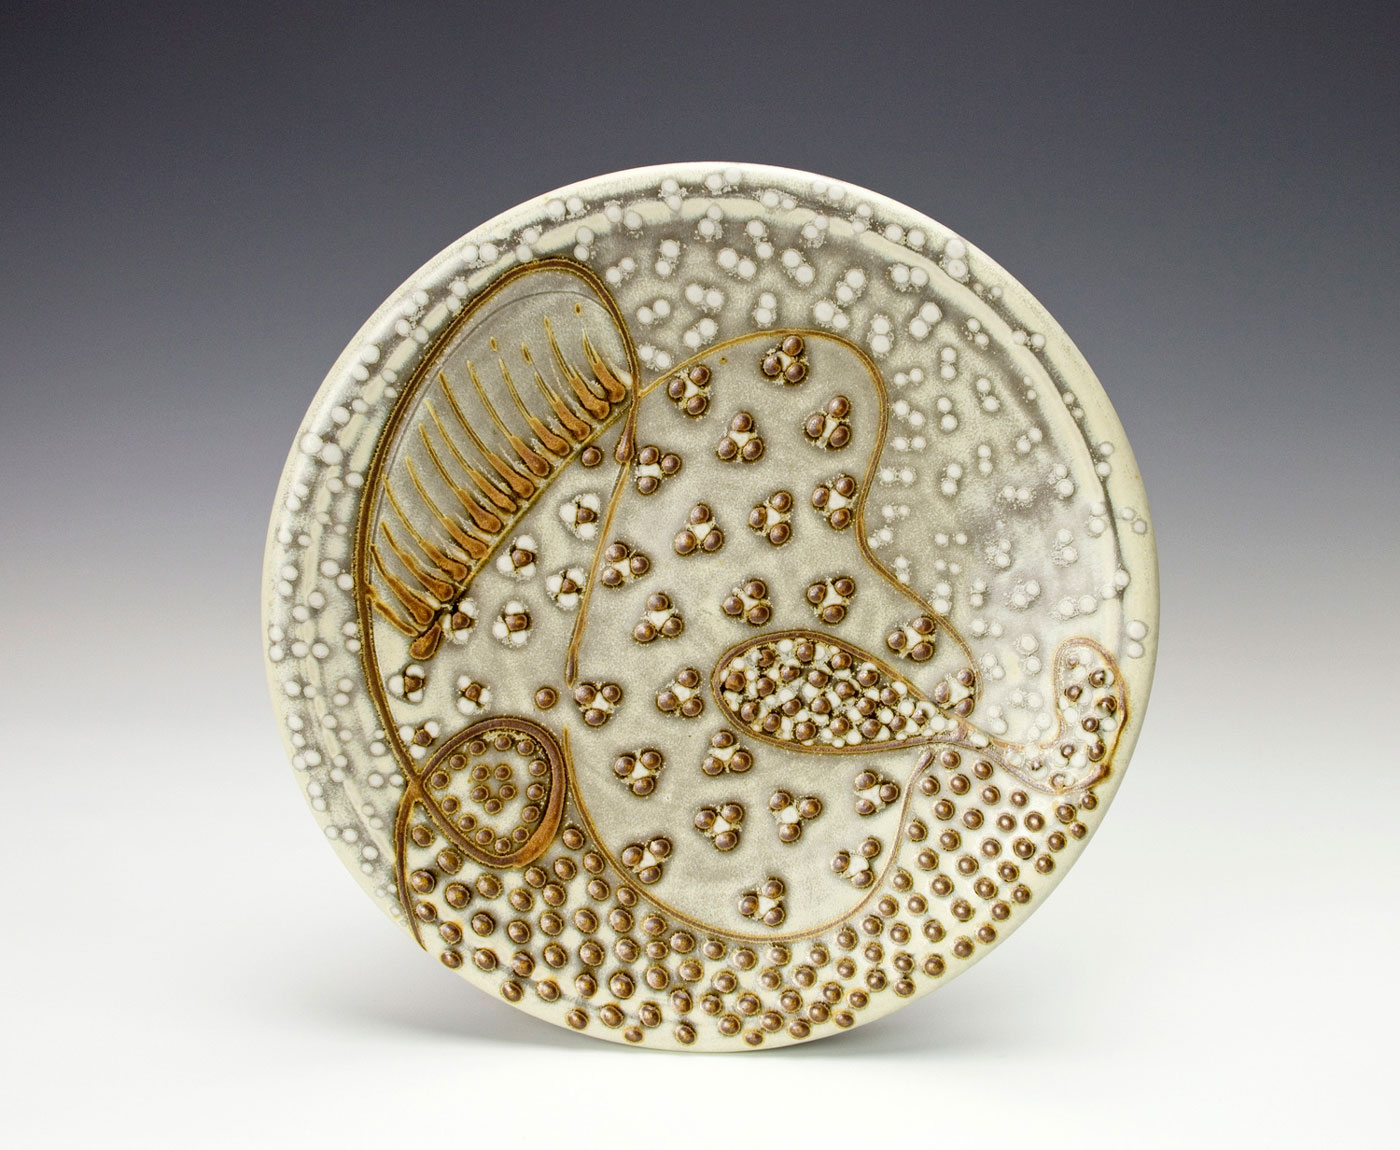 Pattern-medley-salad-pottery-plate-dots-lines-Samantha-Henneke.jpg